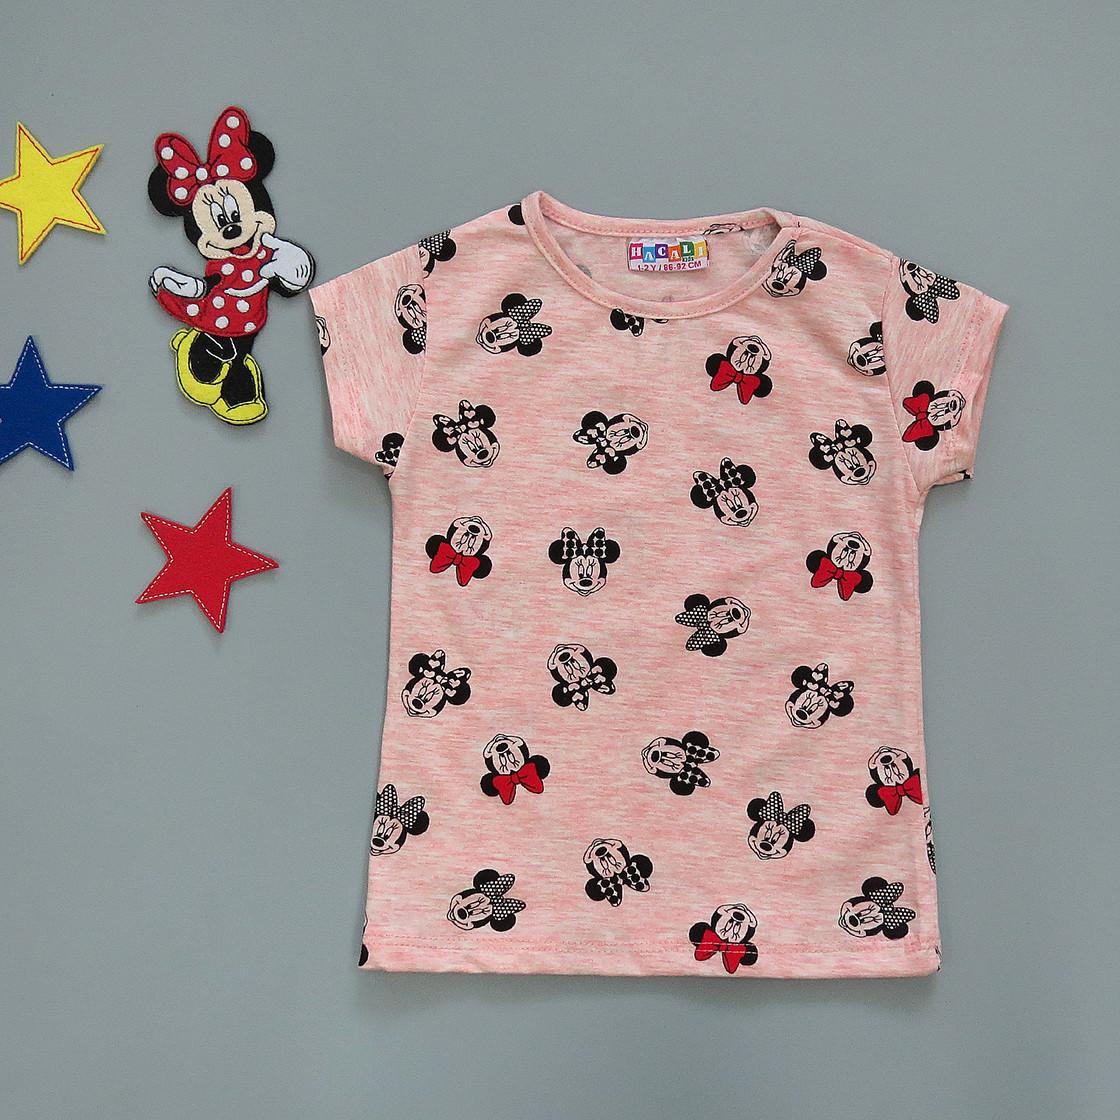 Футболка Minnie Mouse для девочки.